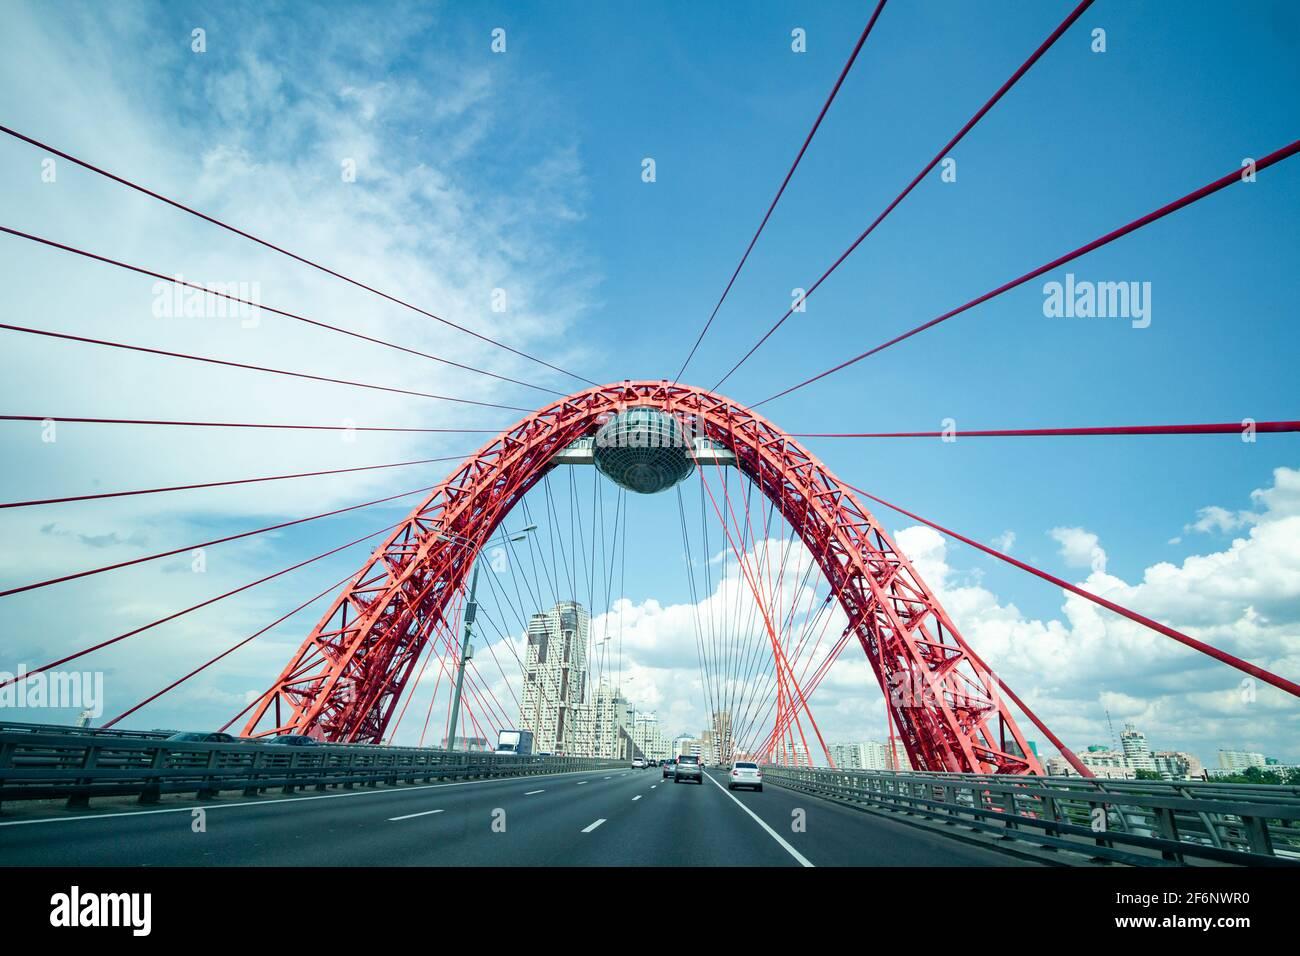 Moskau, Russland - 12. Juli 2020: Rote Kabelbrücke in Moskau. Einzigartige Konstruktionsstruktur. Stockfoto